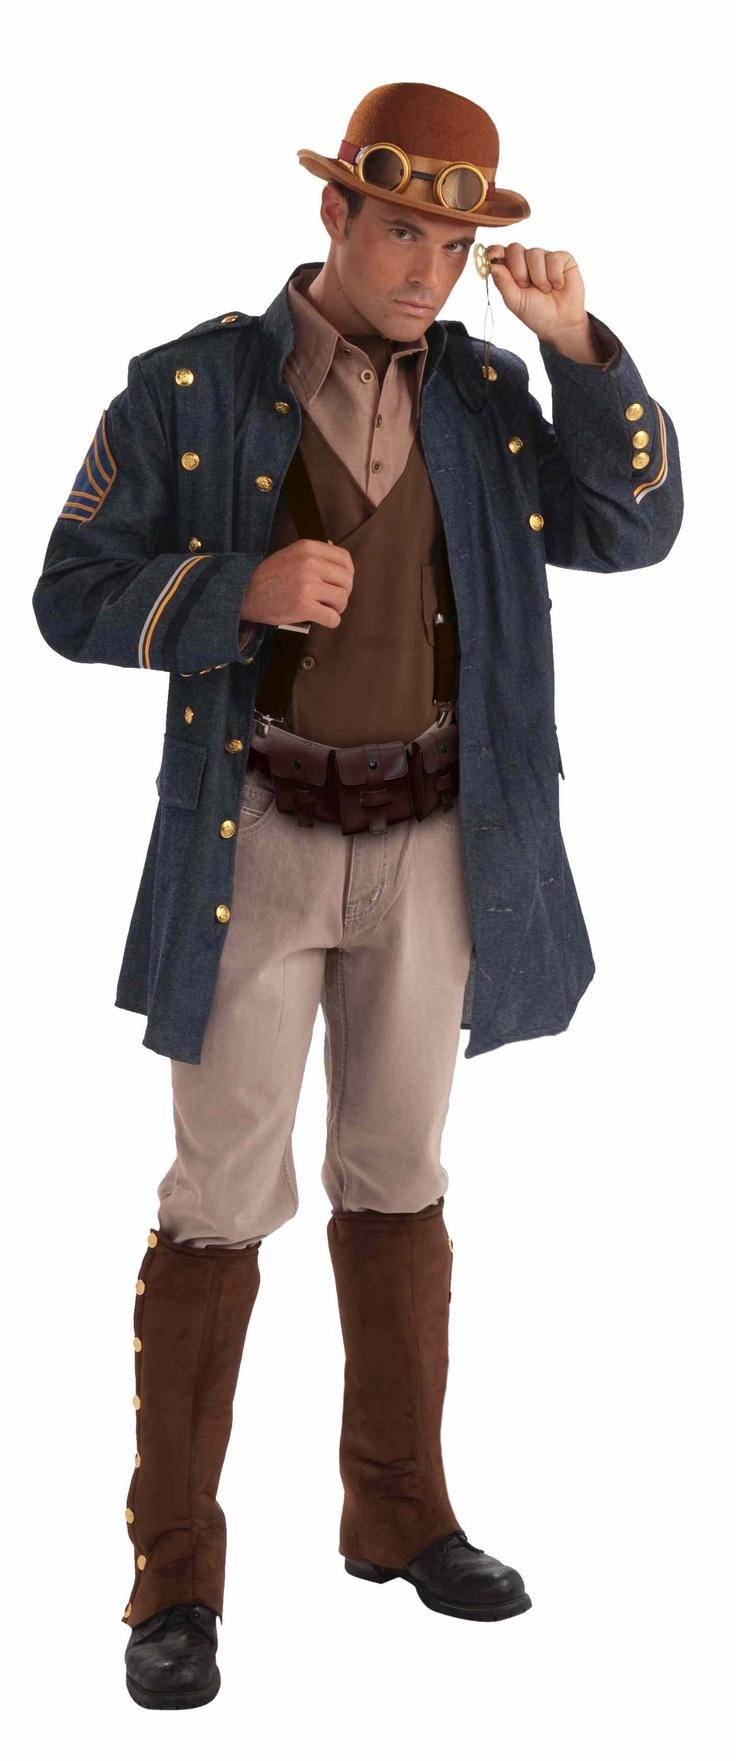 Steampunk Costume | ... costume  Deguisement Adulte  Deguisement Homme  Costume Steampunk